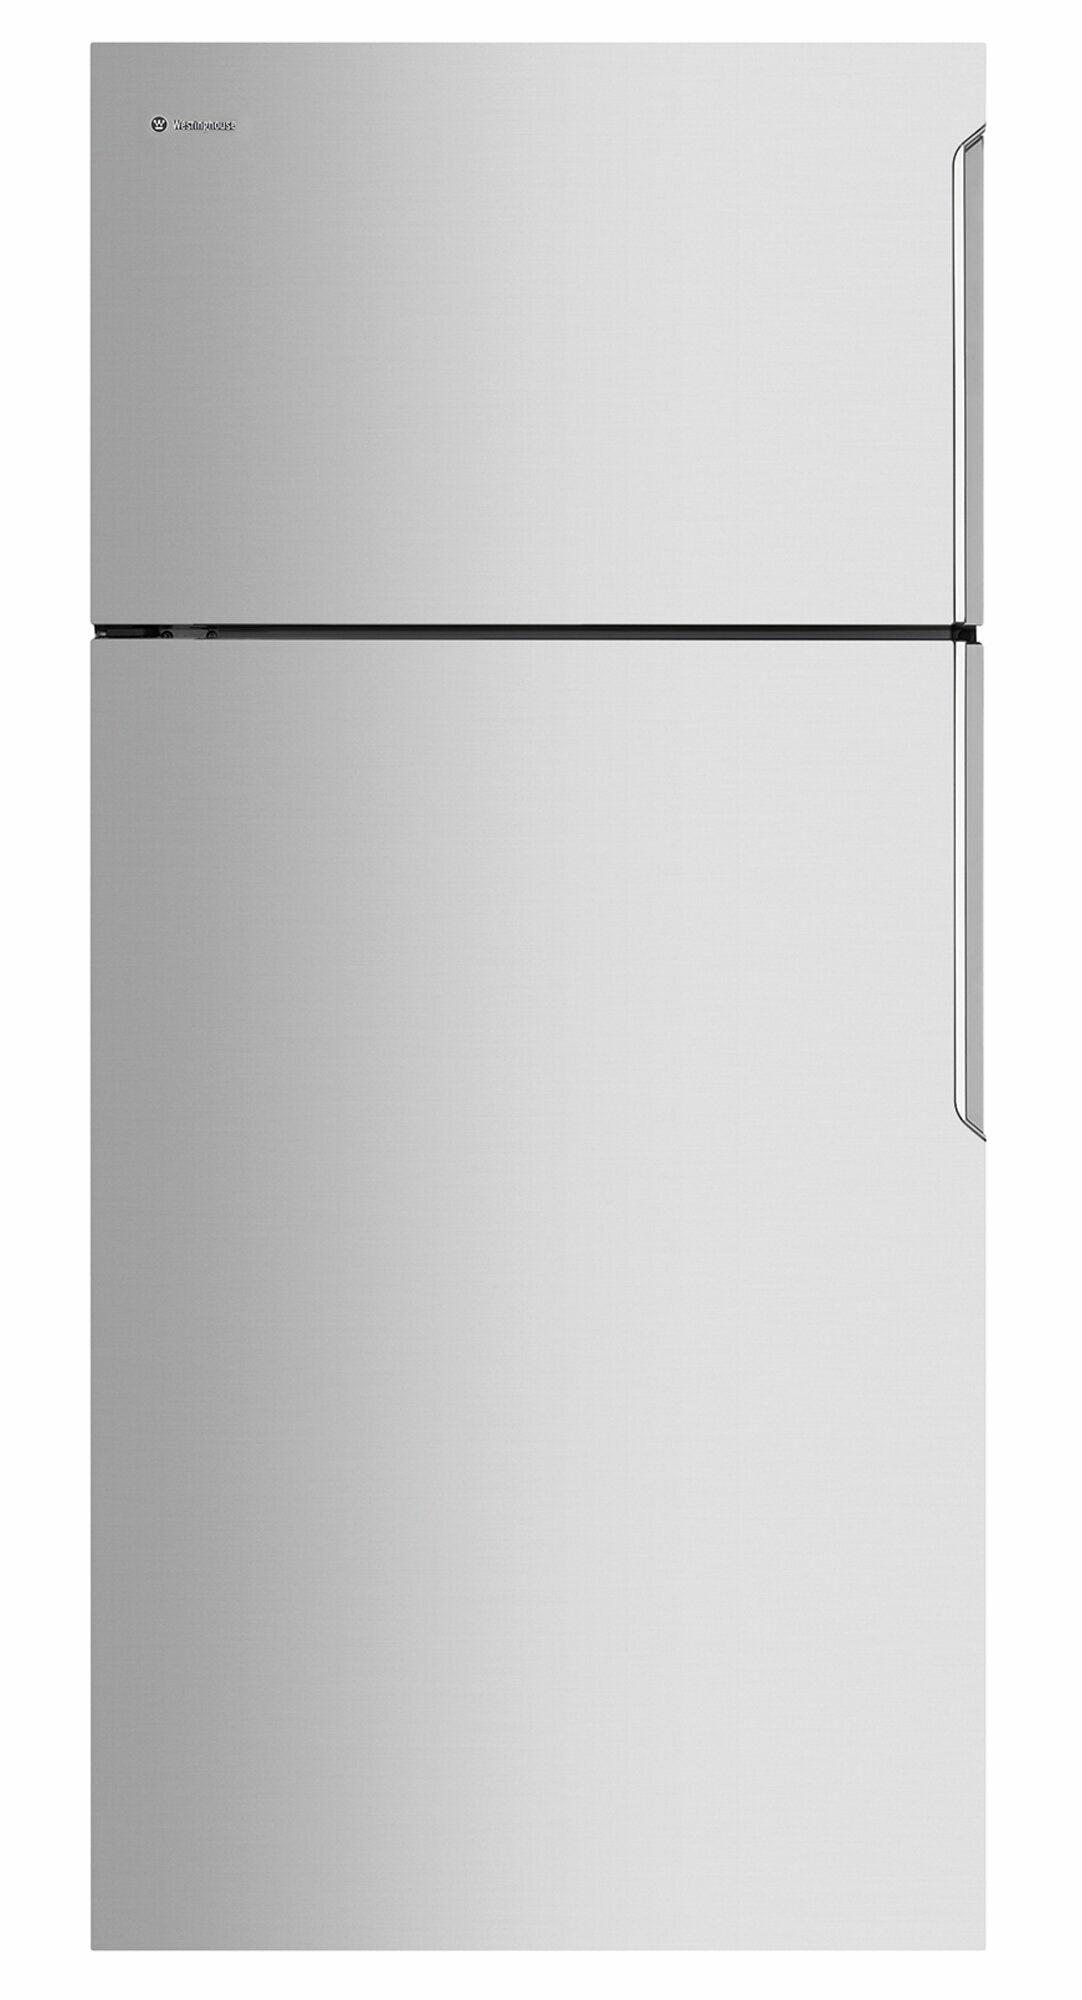 Westinghouse WTB5400SC-L Refrigerator